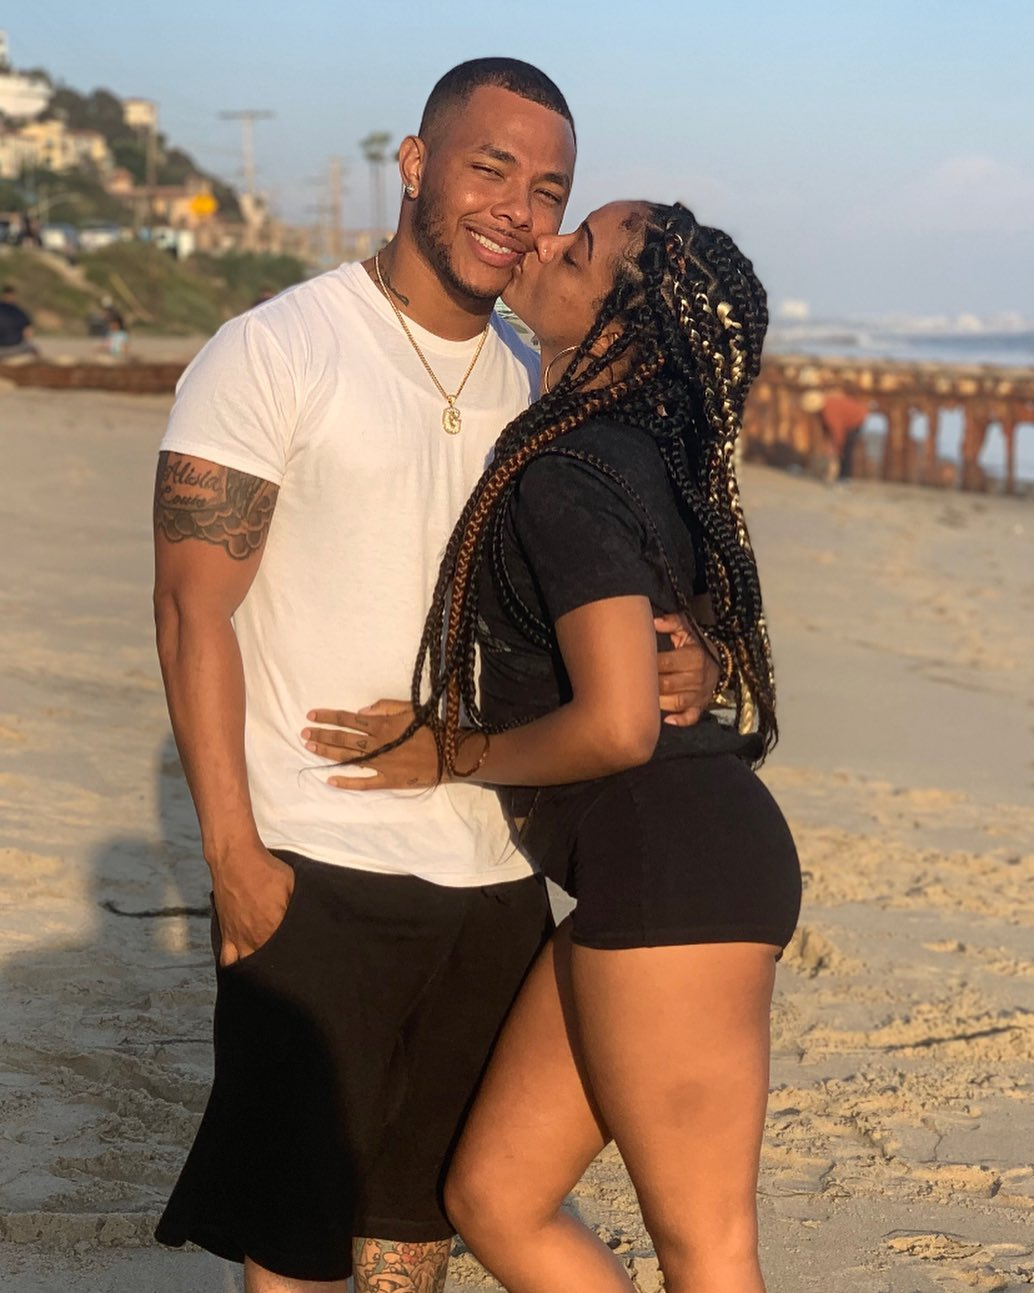 Tyree Boyce and Natalie Adepoju